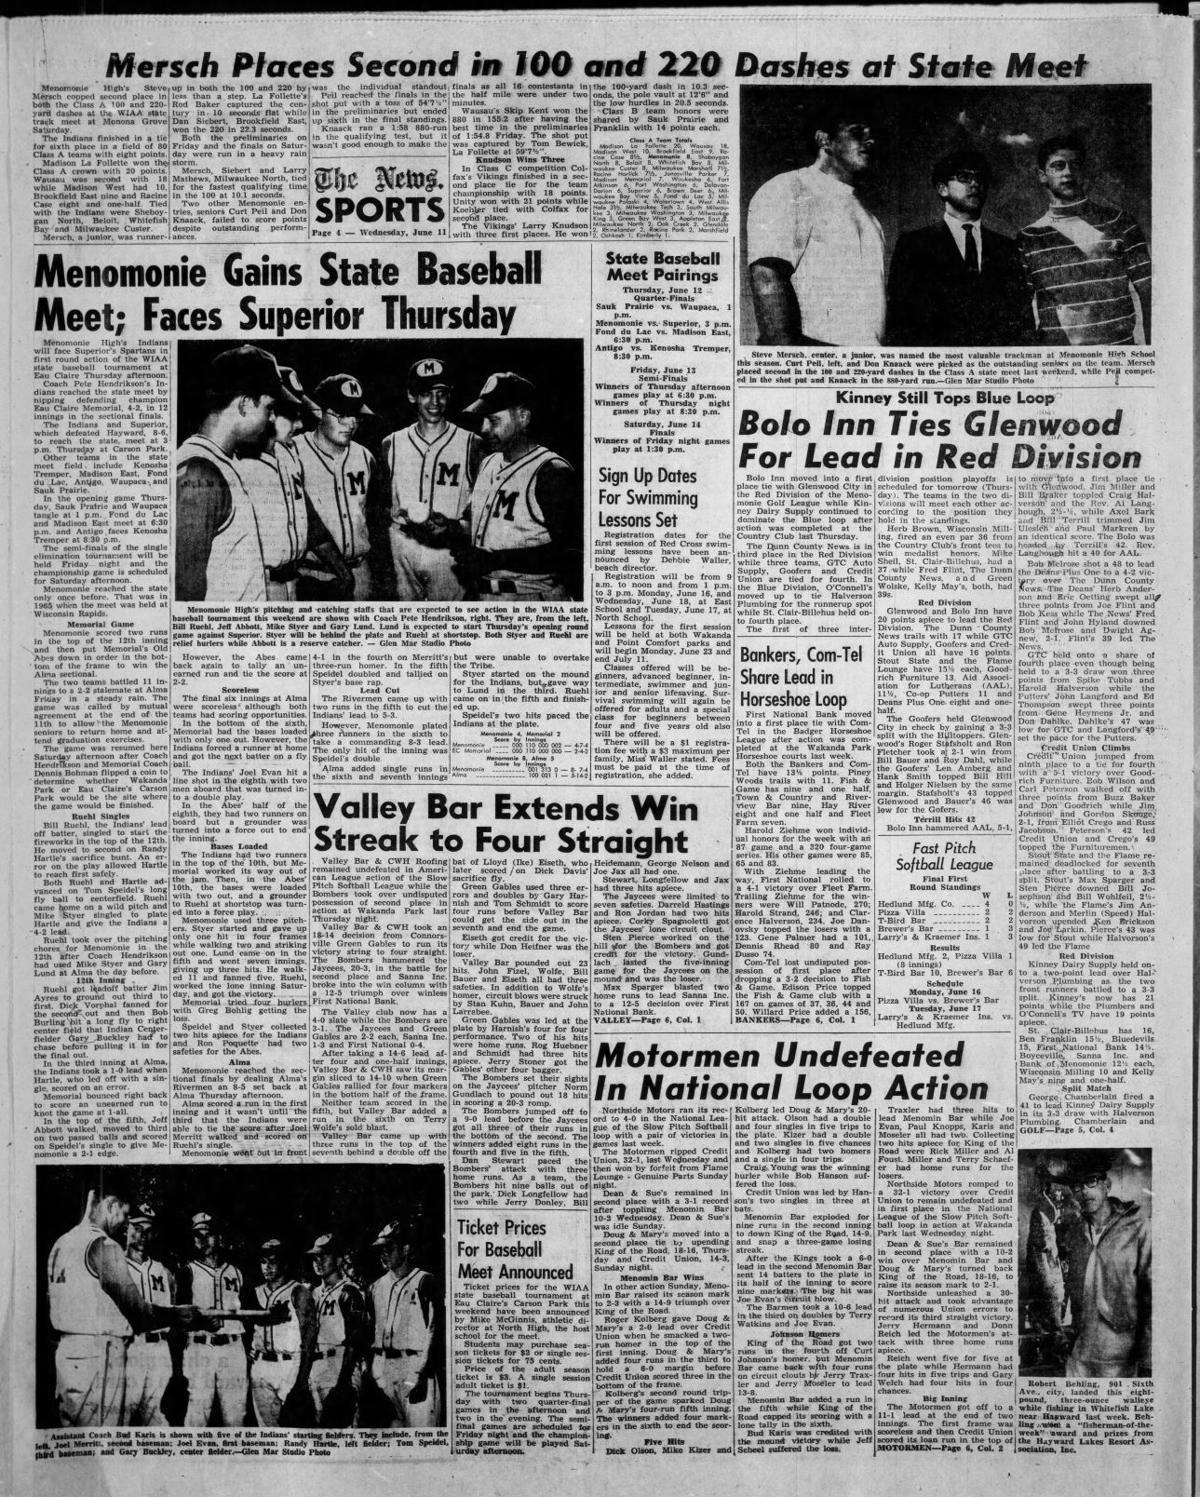 The_Dunn_County_News_Wed__Jun_11__1969_(1).jpg